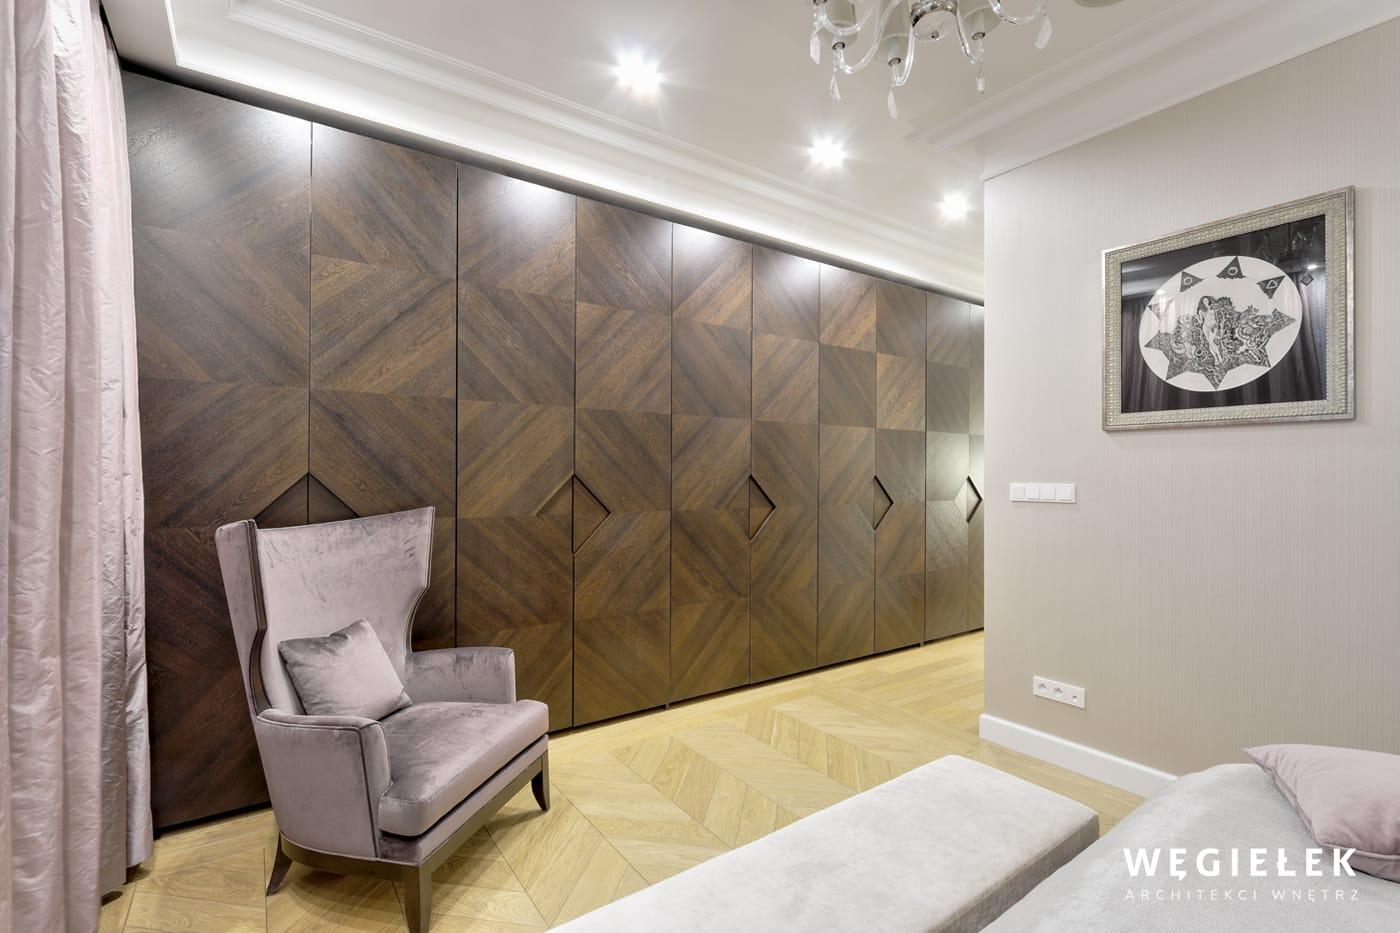 19 apartament morskie oko sypialnia master szafa dąb ciemny